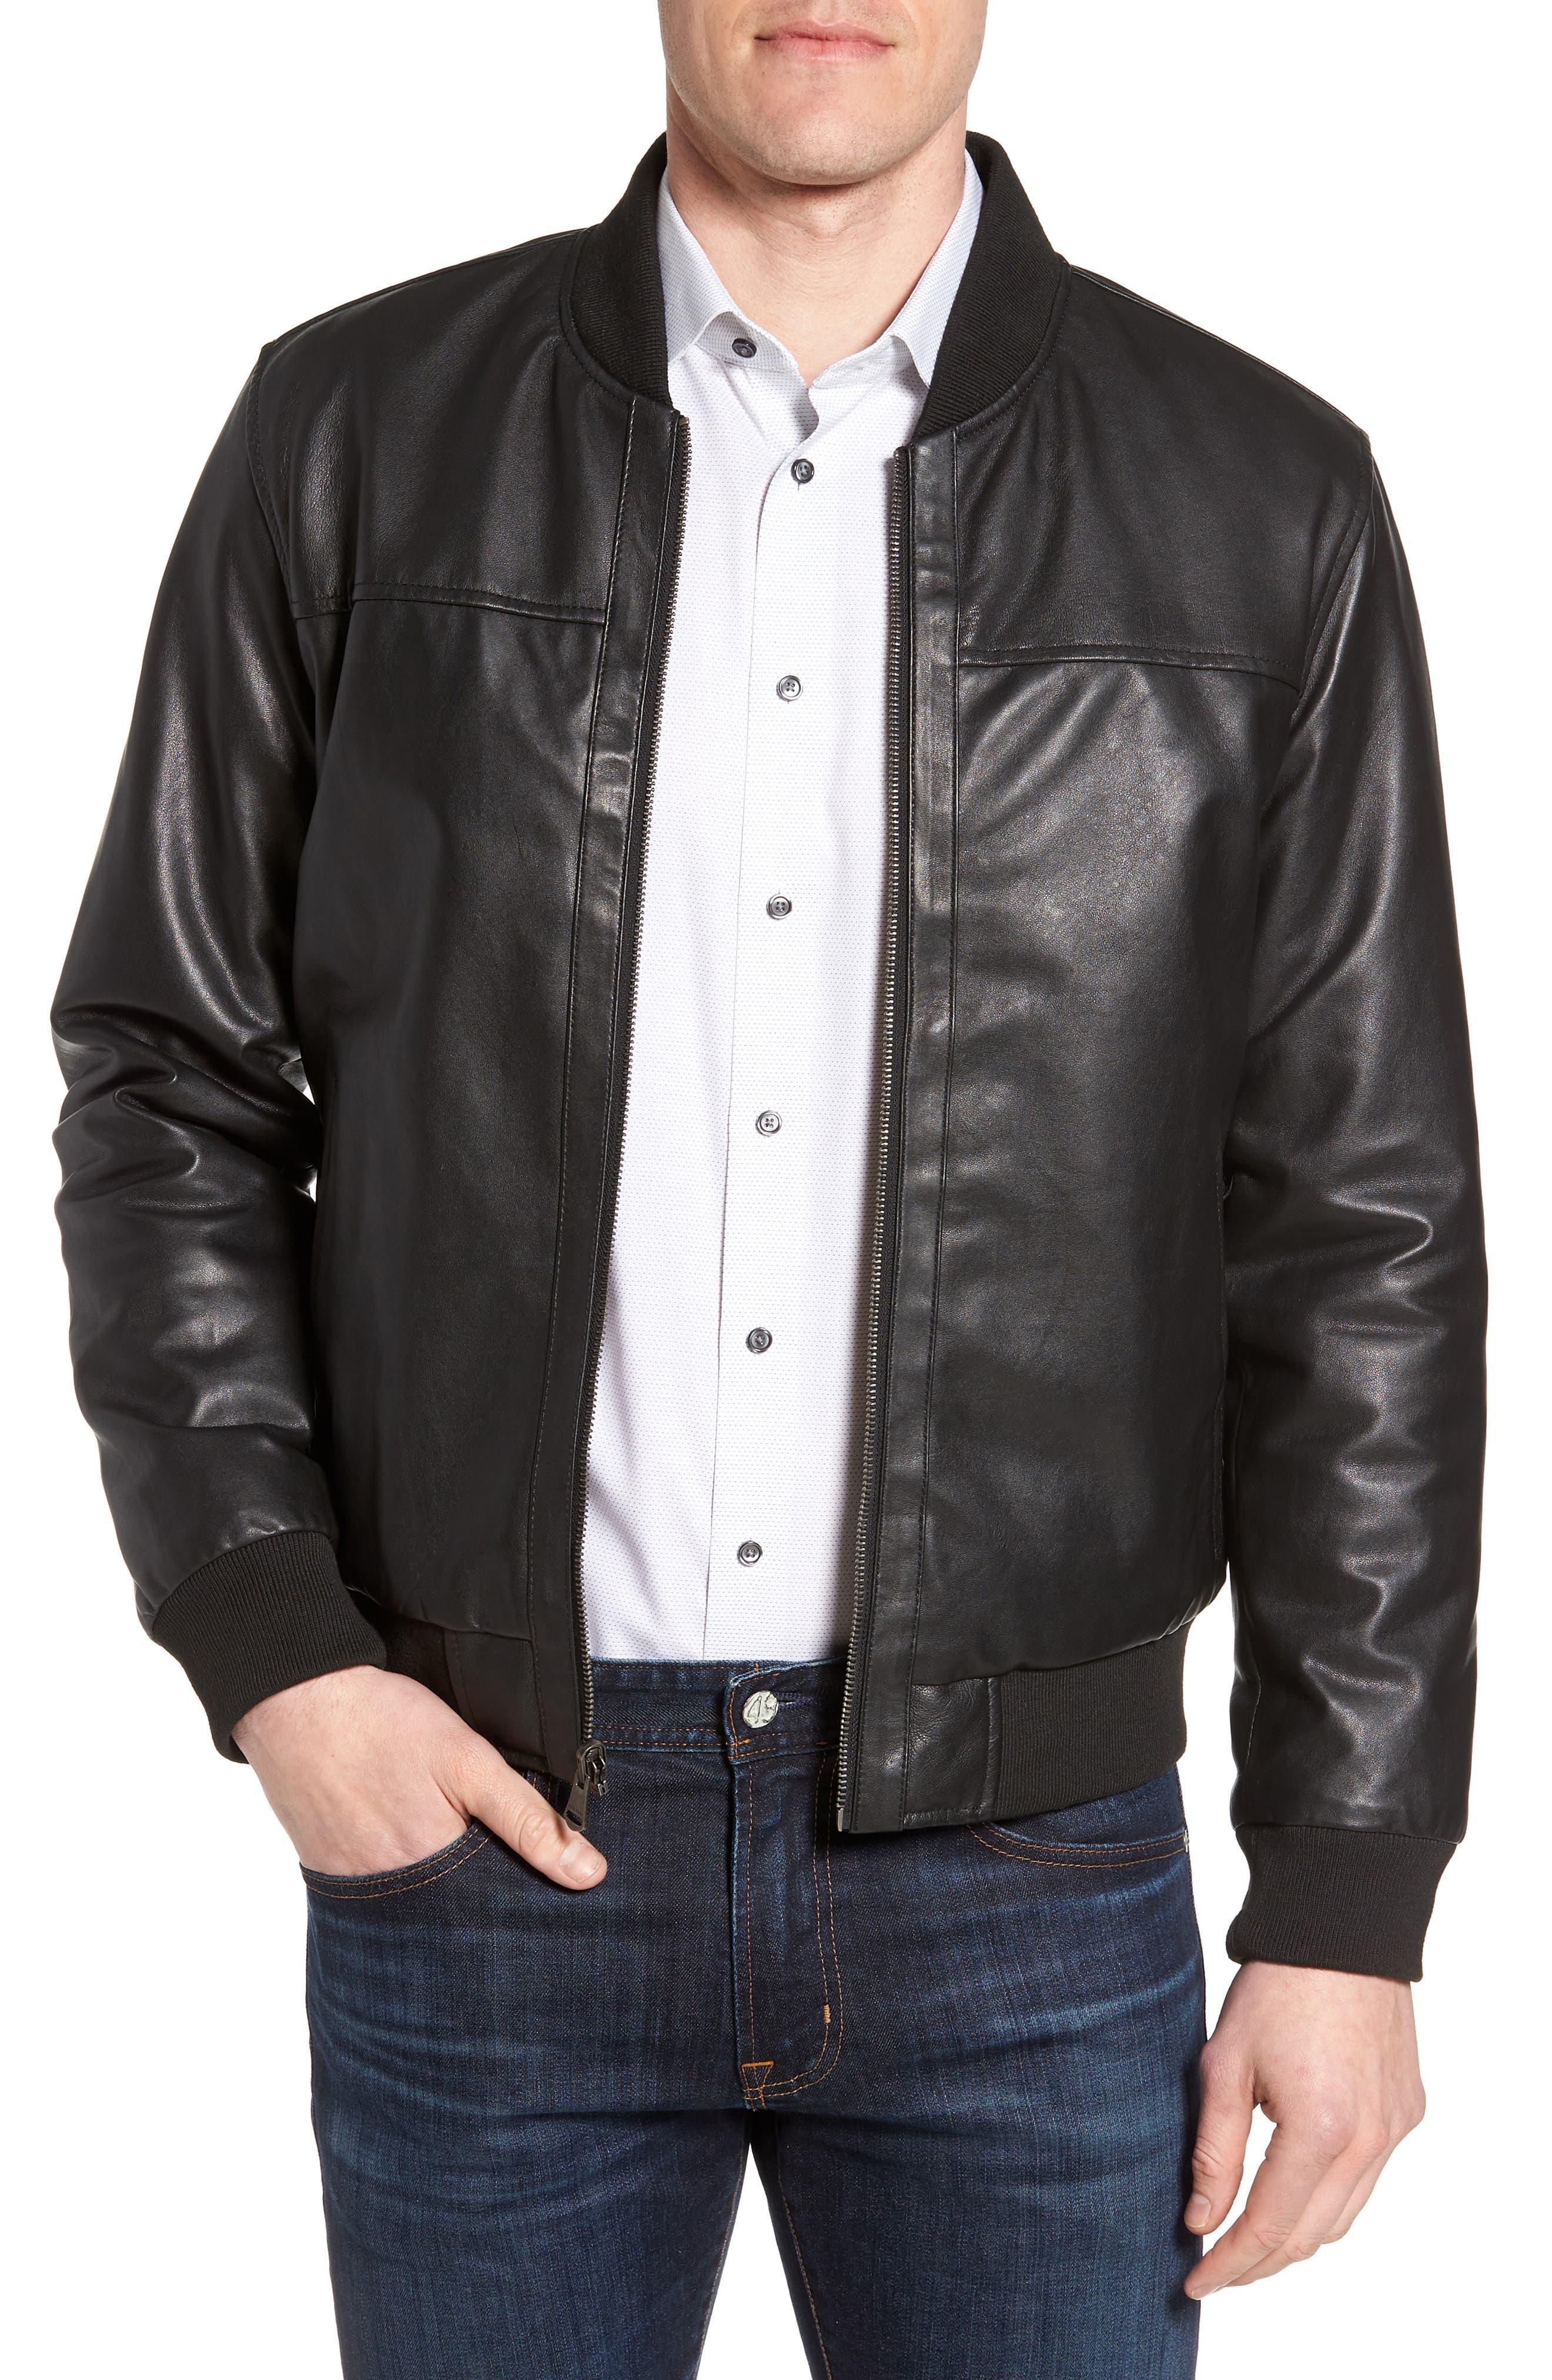 Reversible Leather Jacket,                             Main thumbnail 1, color,                             Black/ Navy